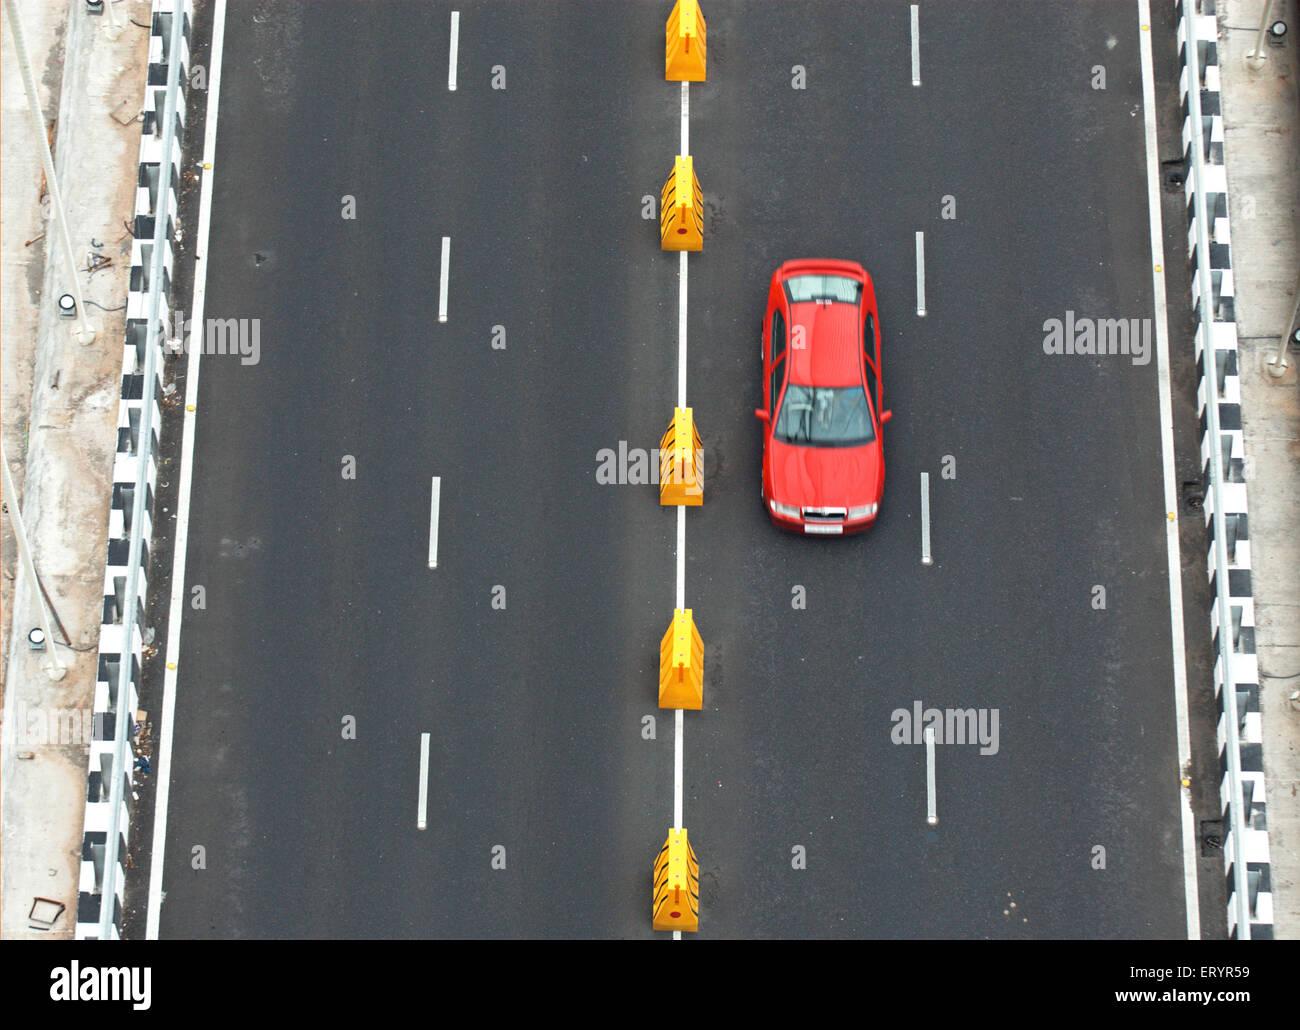 Car on twin carriageway of bandra worli known rajiv gandhi sea link ; Bombay Mumbai ; Maharashtra ; India 8 August - Stock Image